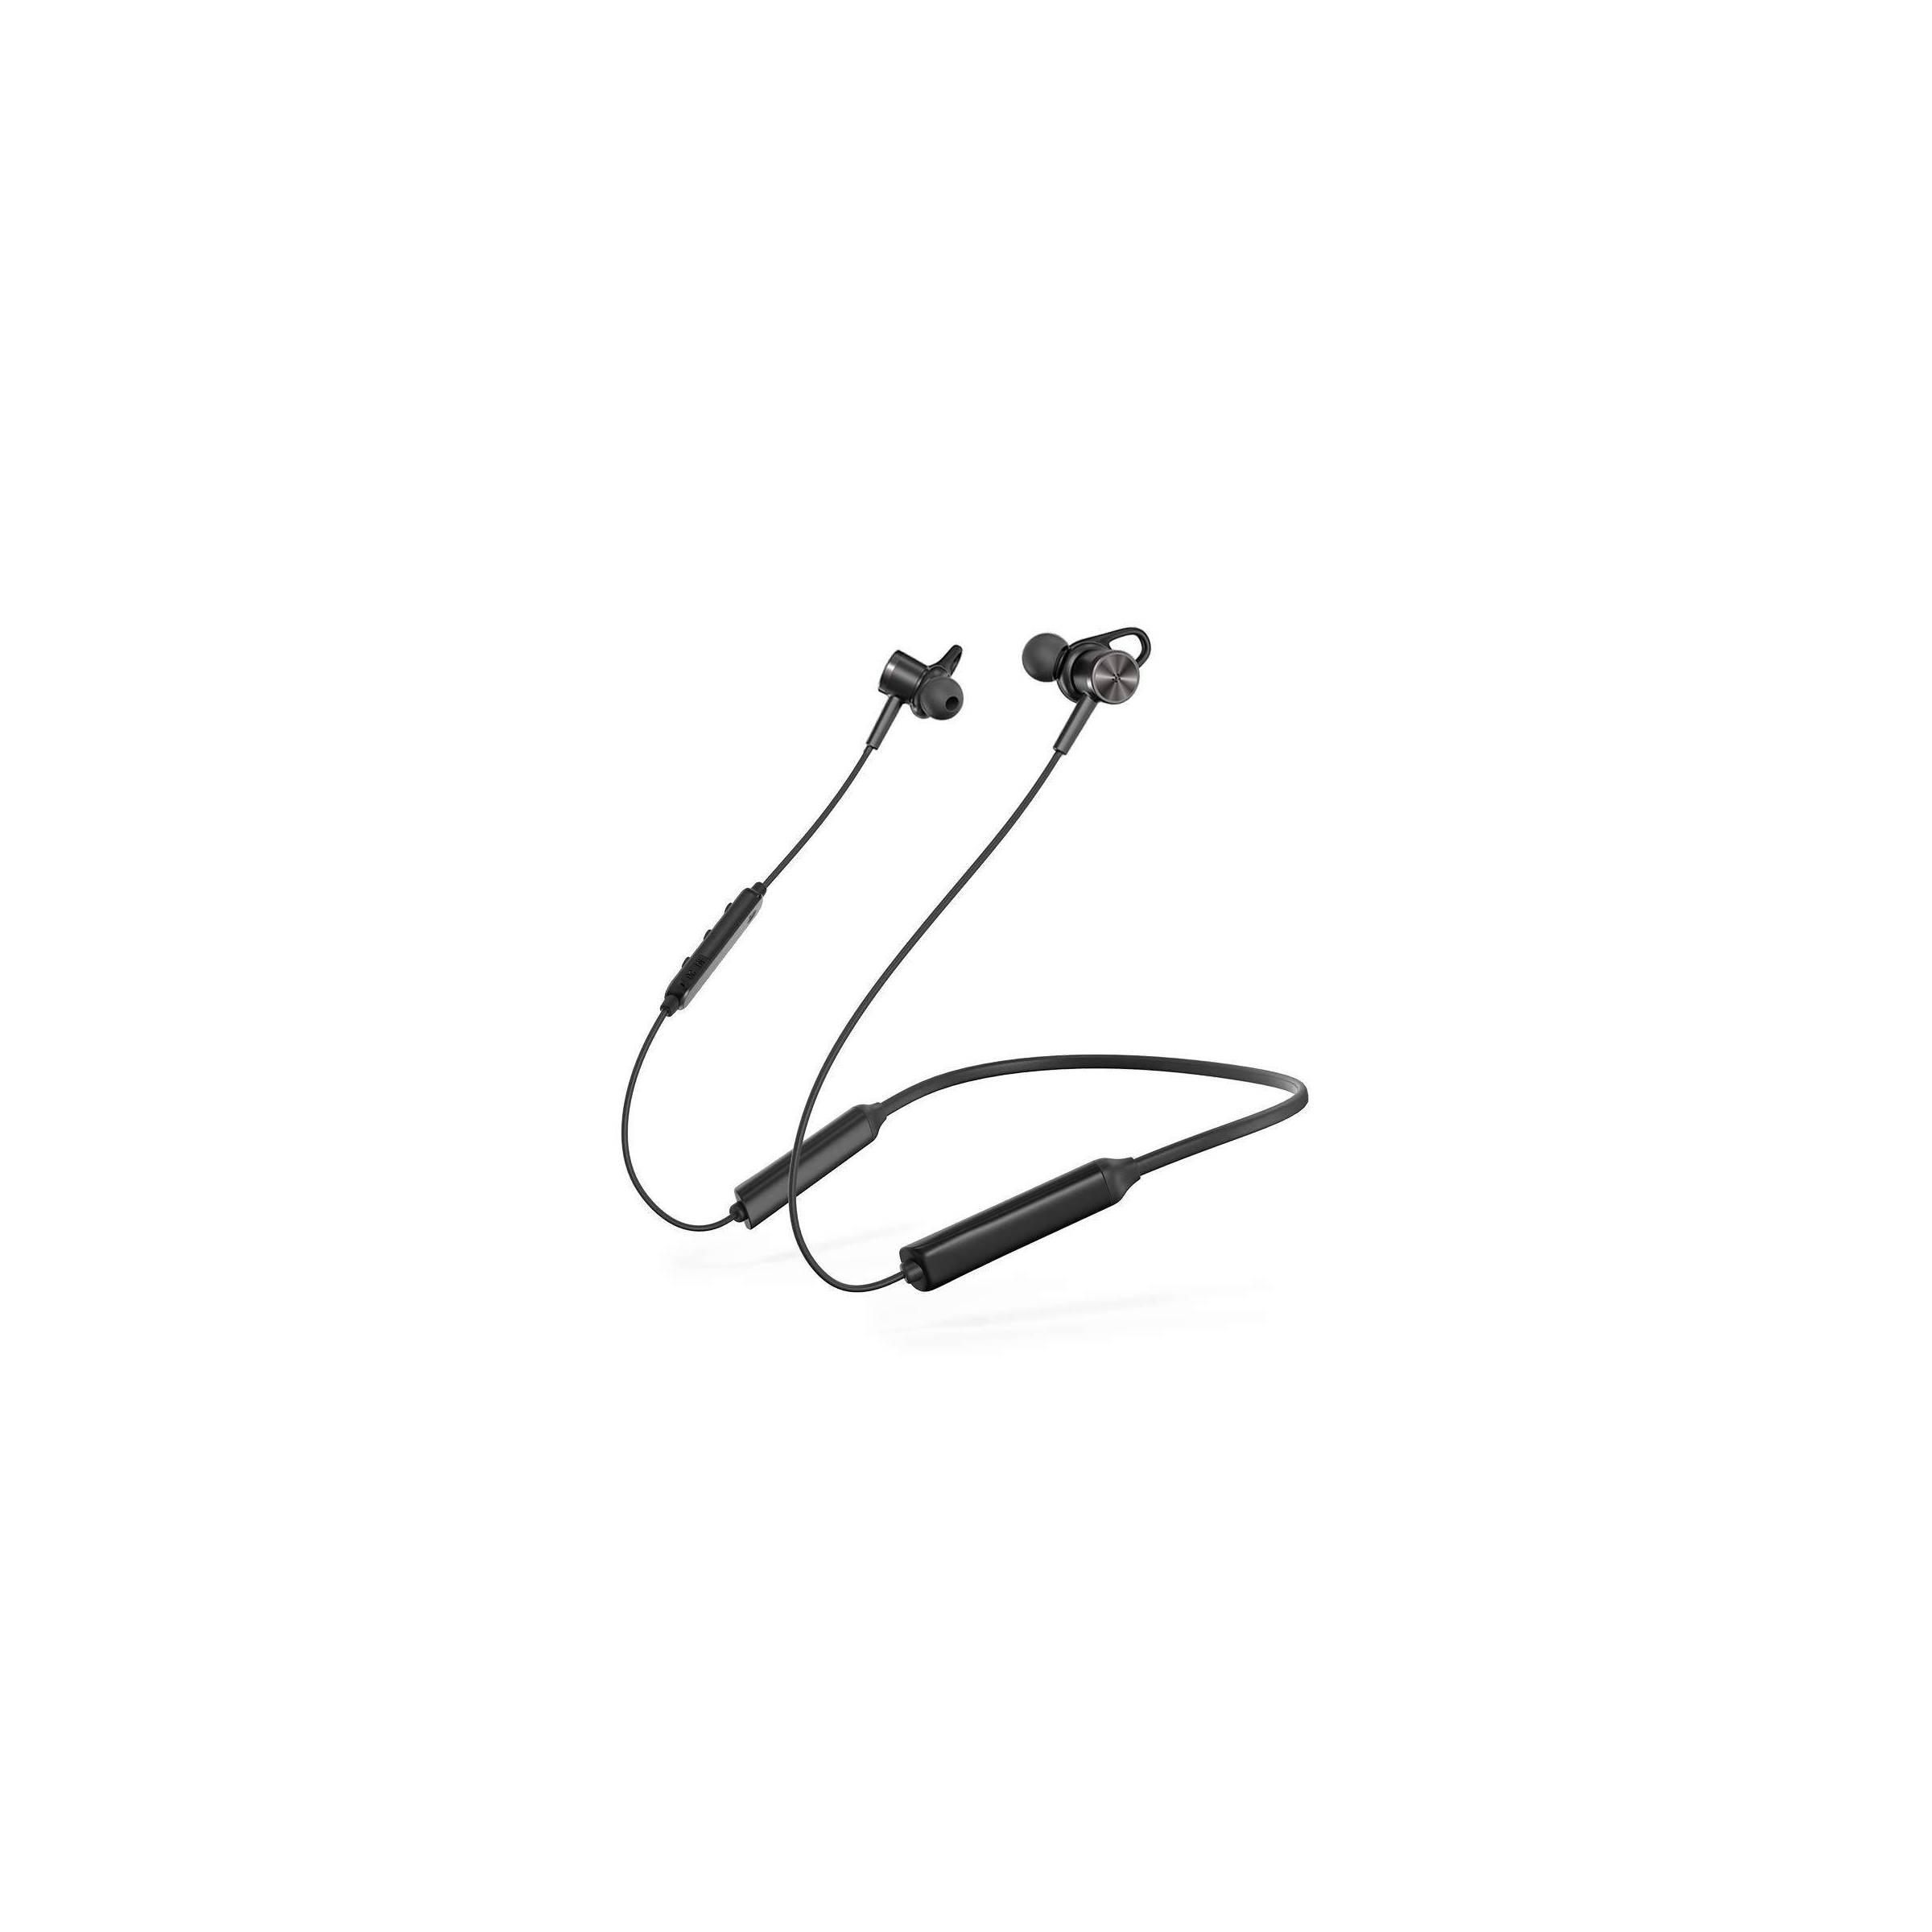 taotronics Taotronics in-ear earphones nakkebøjle m. aktiv noise reduction på mackabler.dk